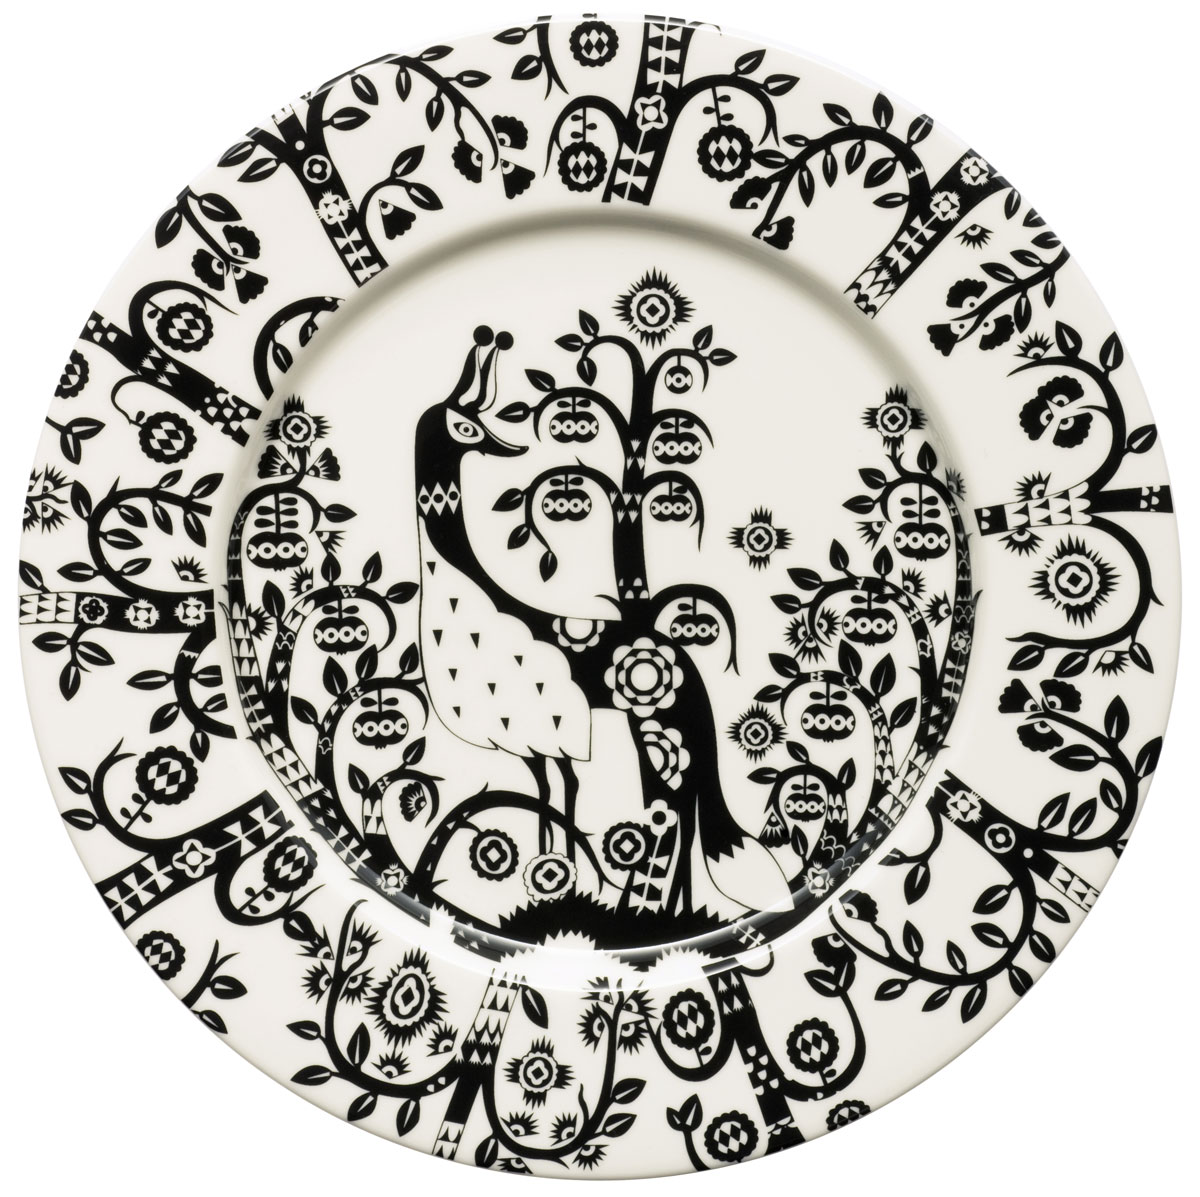 Тарелка Iittala Taika, цвет: черный, диаметр 22 см1012496